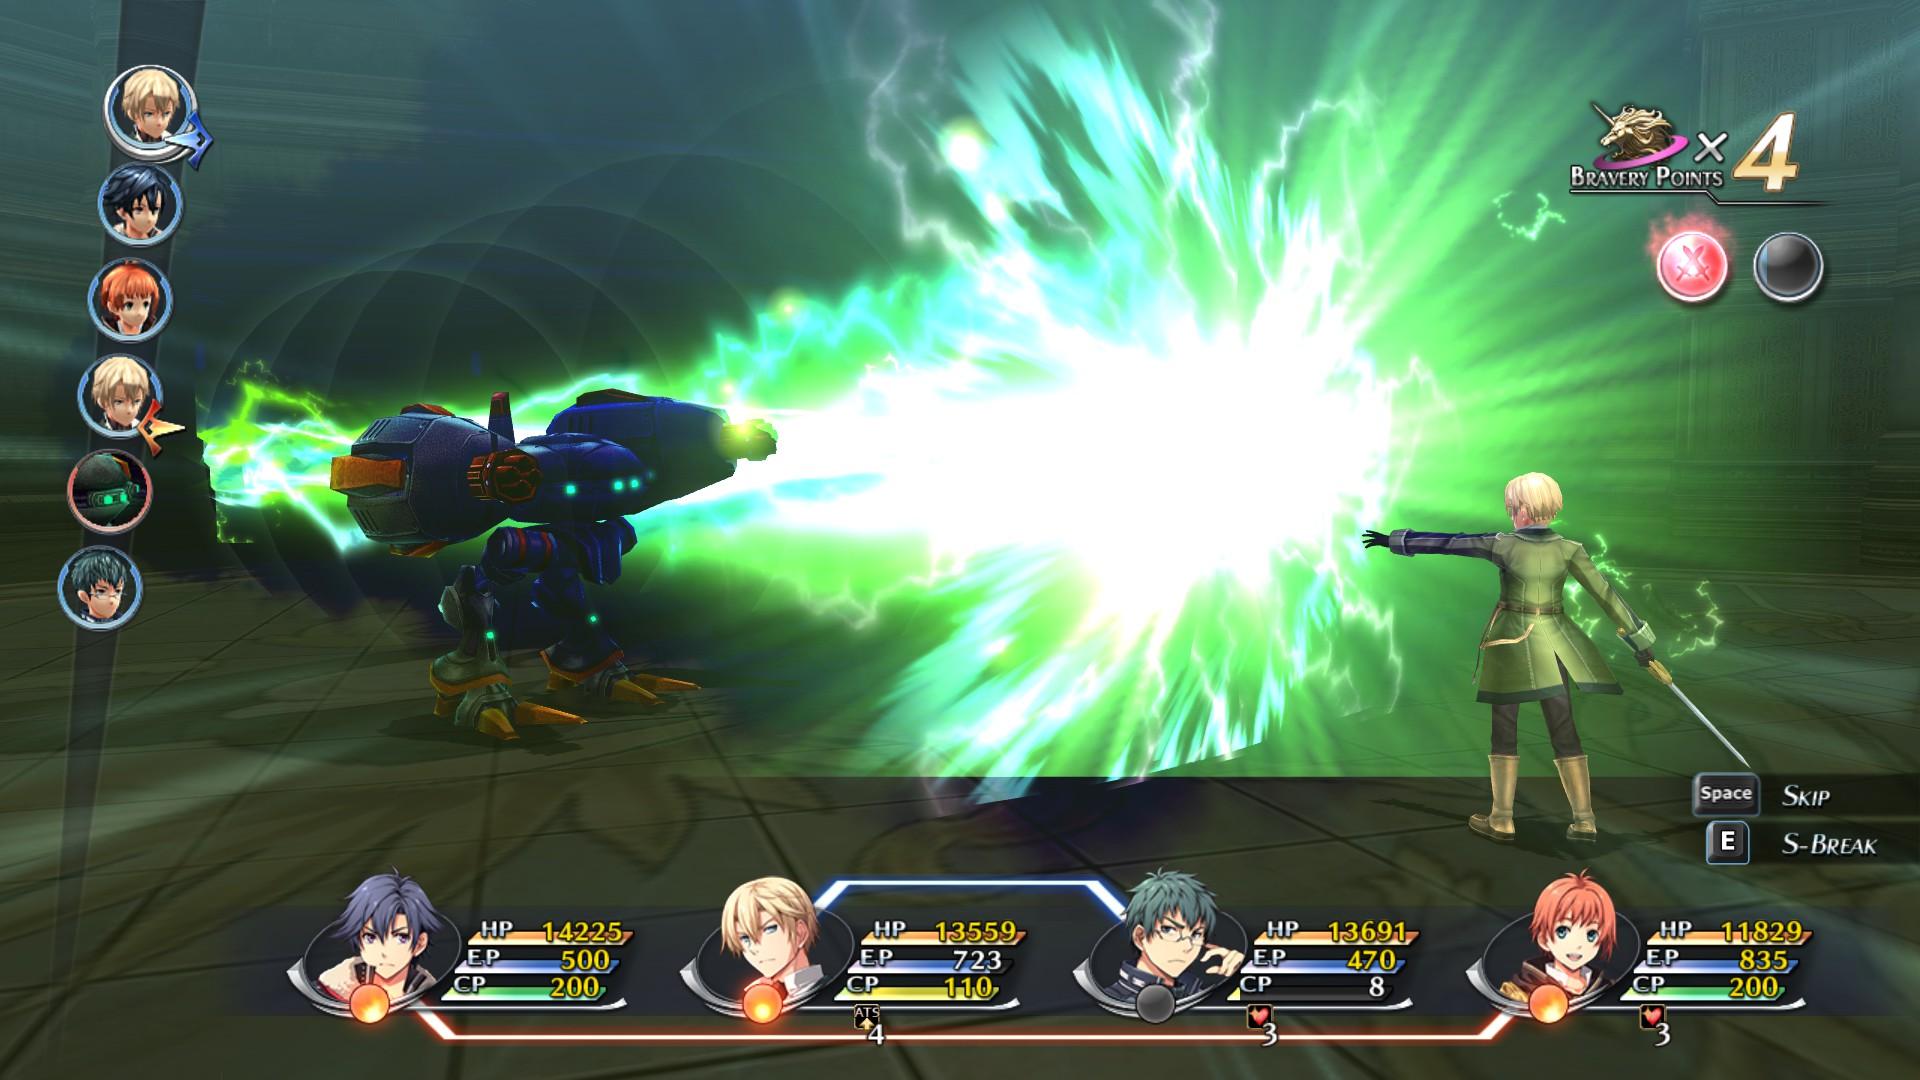 The_Legend_of_Heroes__Trails_of_Cold_Steel_II_-_Screenshot01